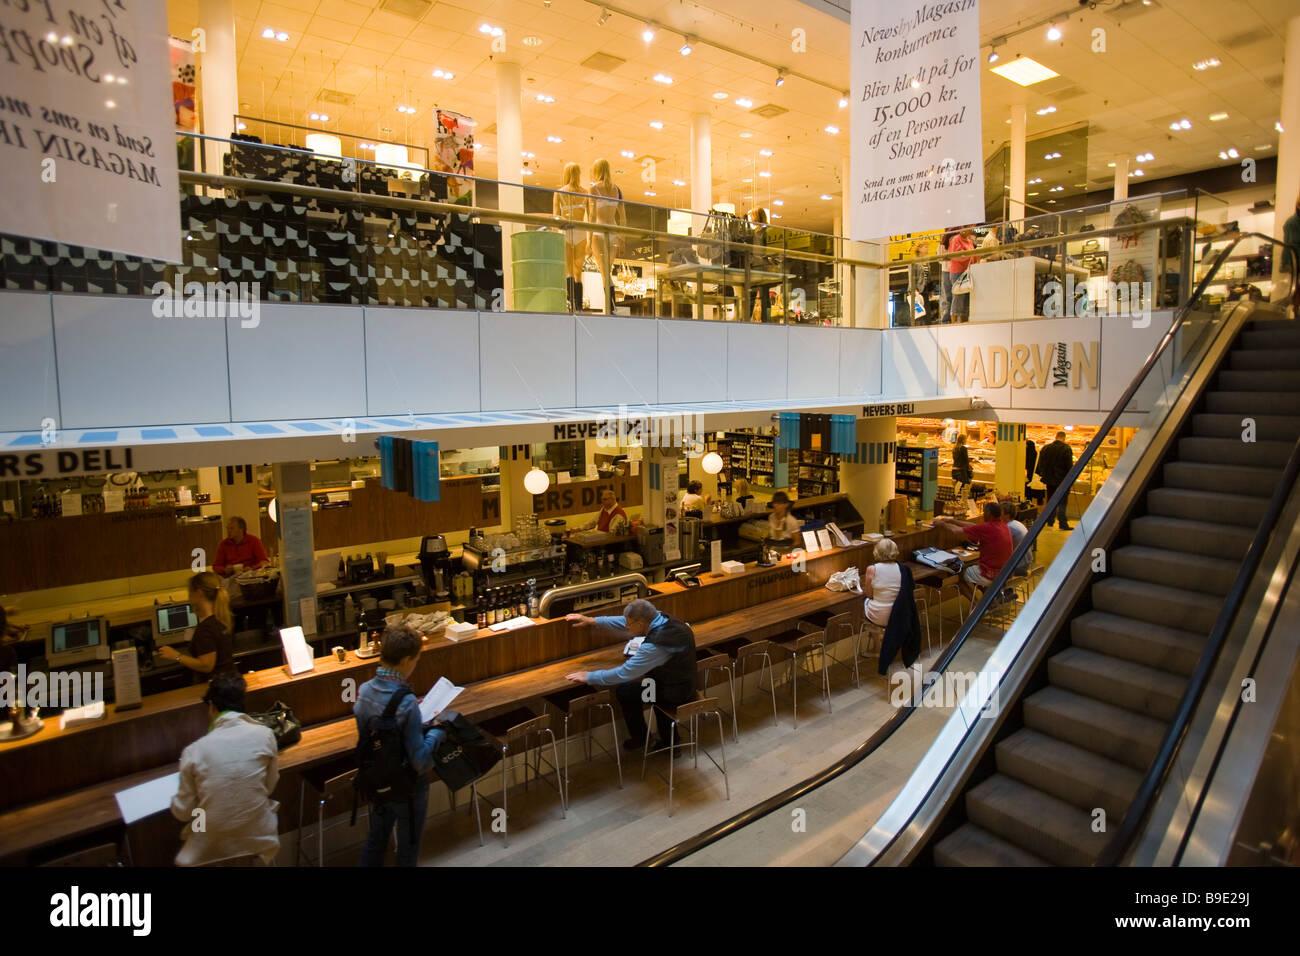 Magasin du Nord department store Copenhagen Zealand Denmark - Stock Image